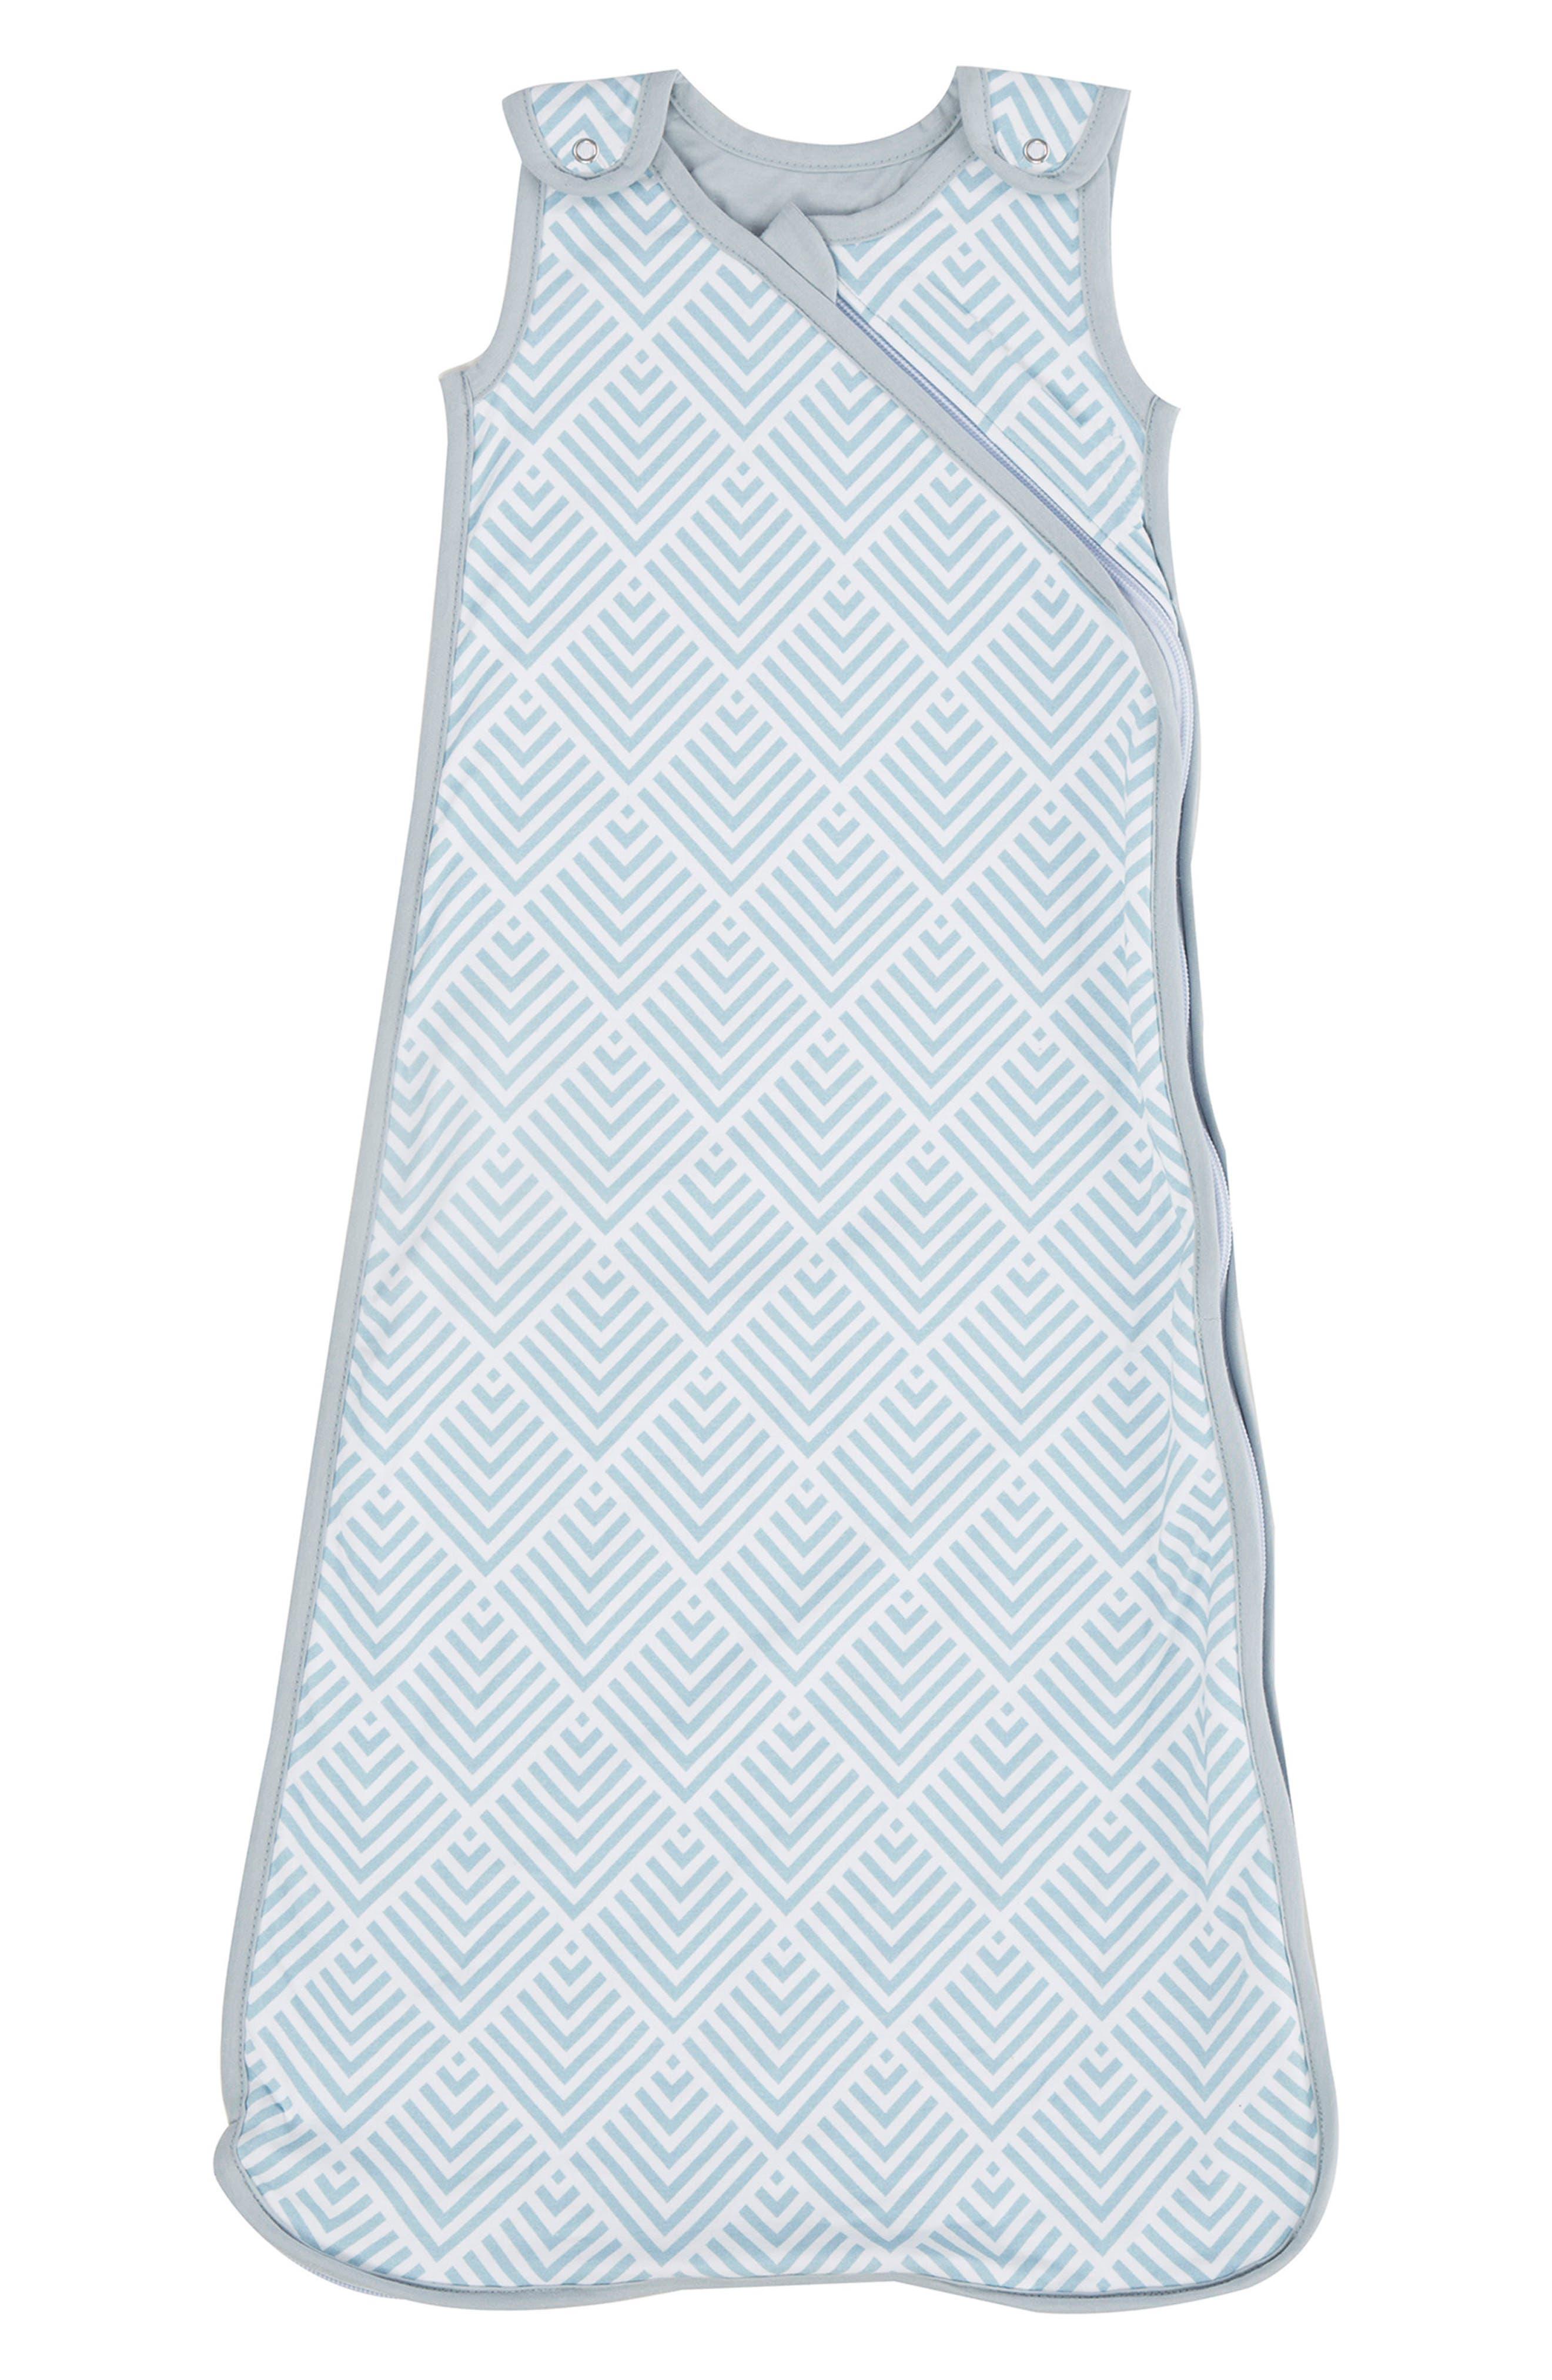 Oilo Stroller Blanket & Wearable Blanket Set (Baby)